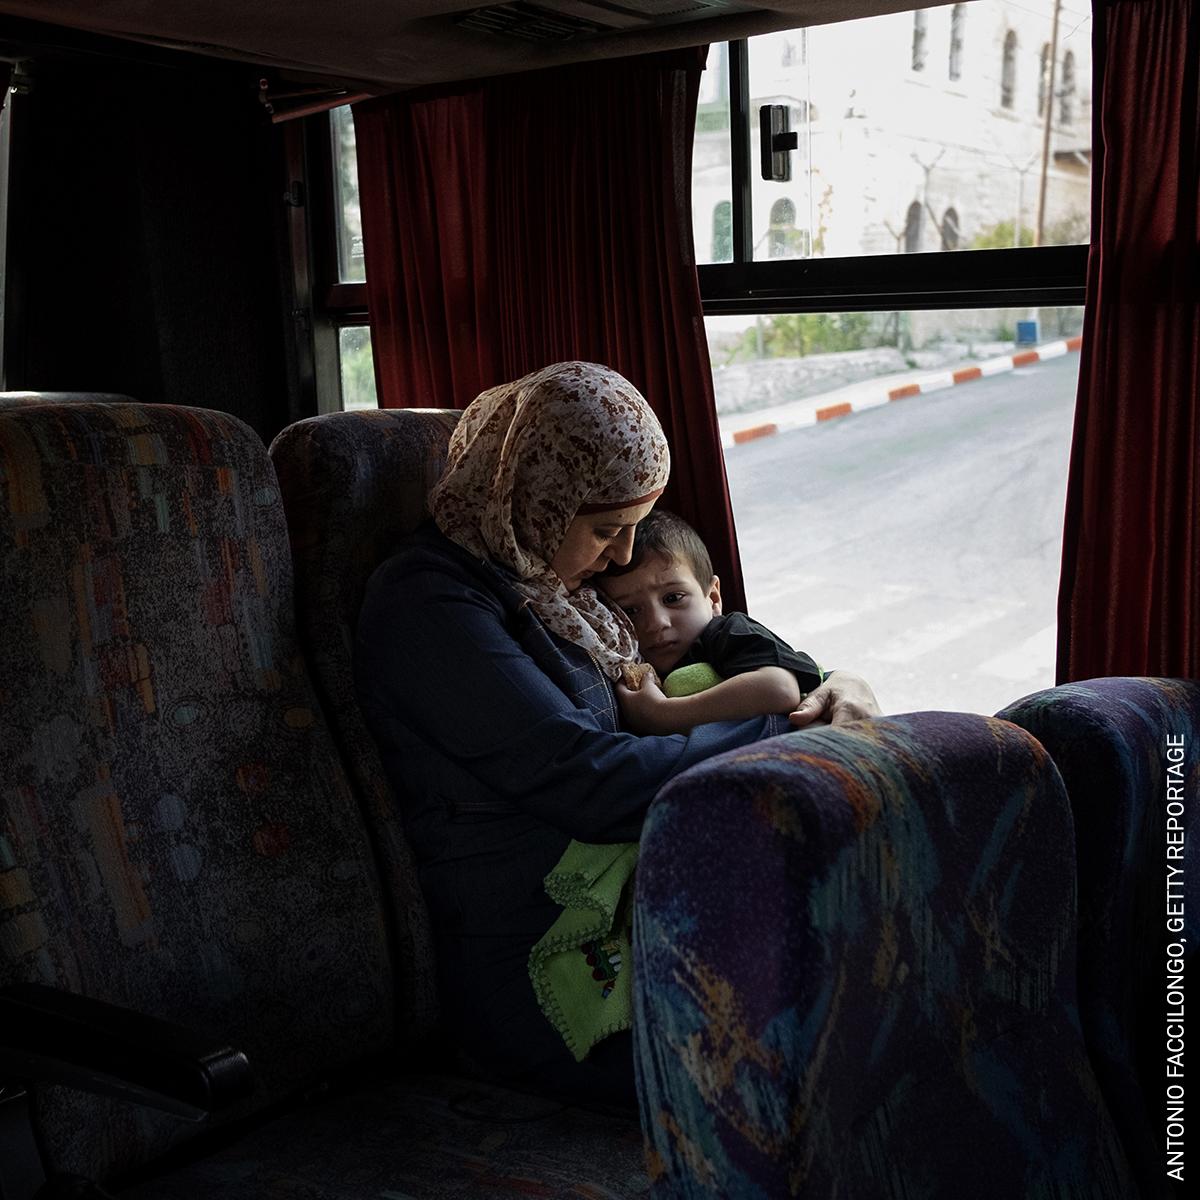 017_World Press Photo Story of the Year Nominee_Online_Antonio Faccilongo_Getty Reportage